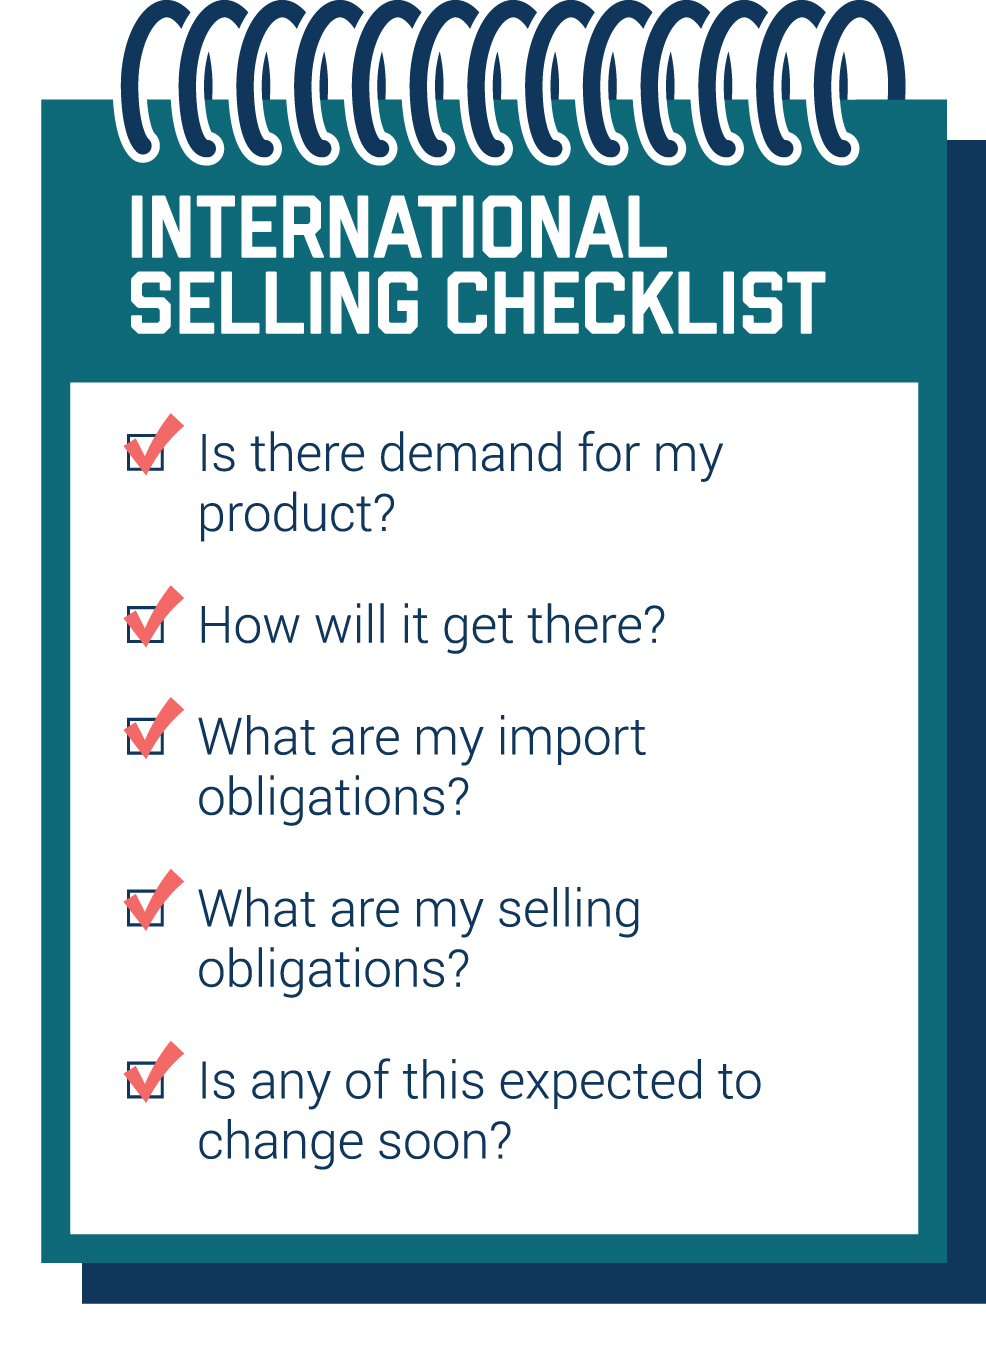 International-Selling-Checklist.jpg